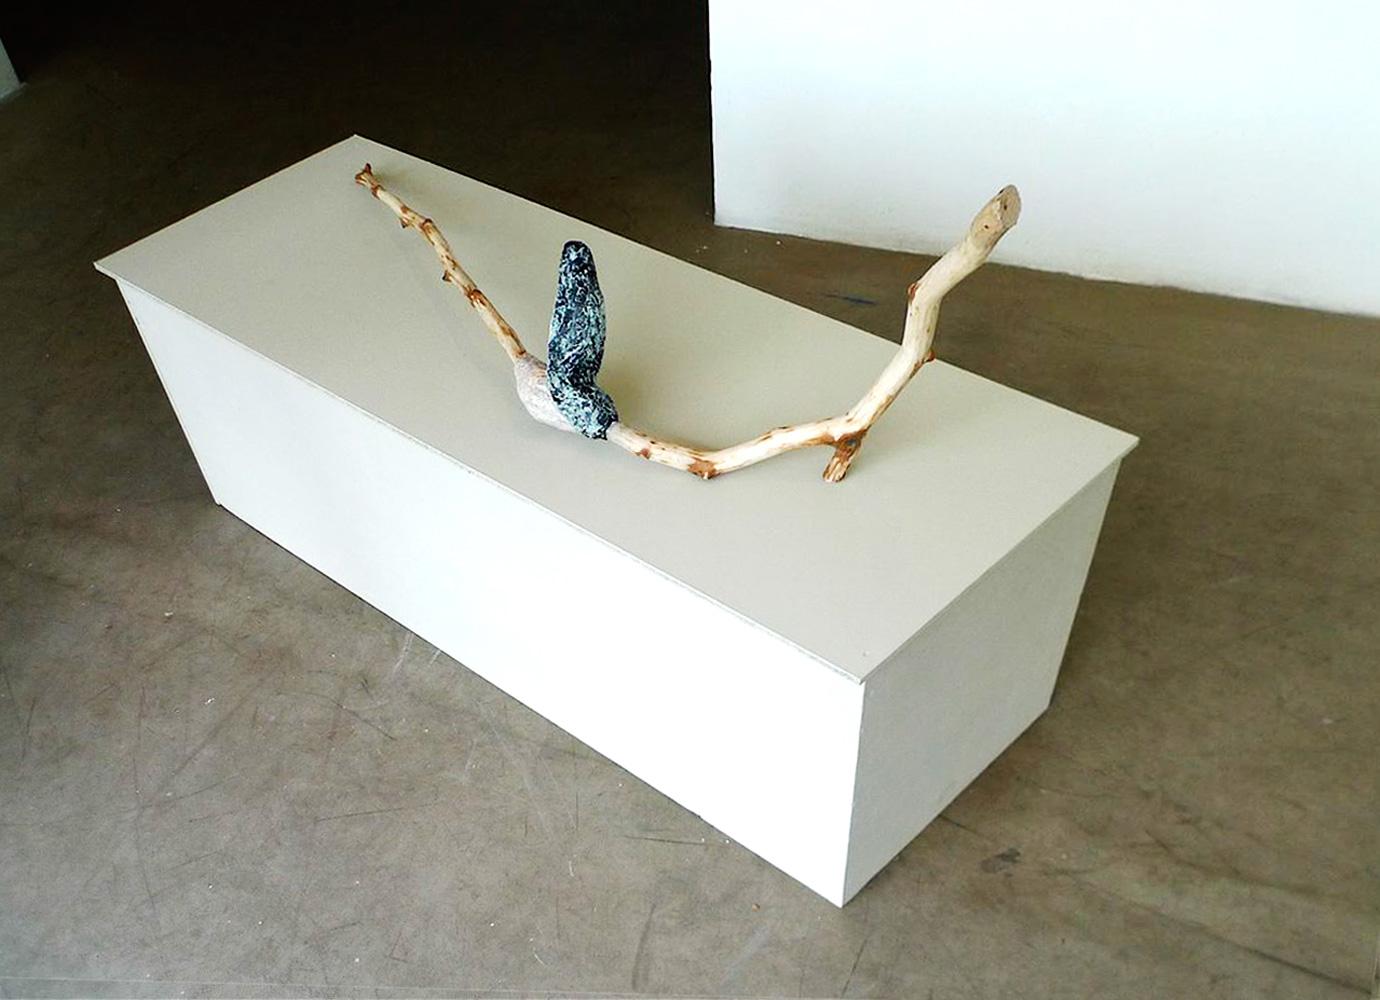 Gedachtenknoop, 2016, 99 x 47 x 37 cm, hout, papier maché klei, acryl